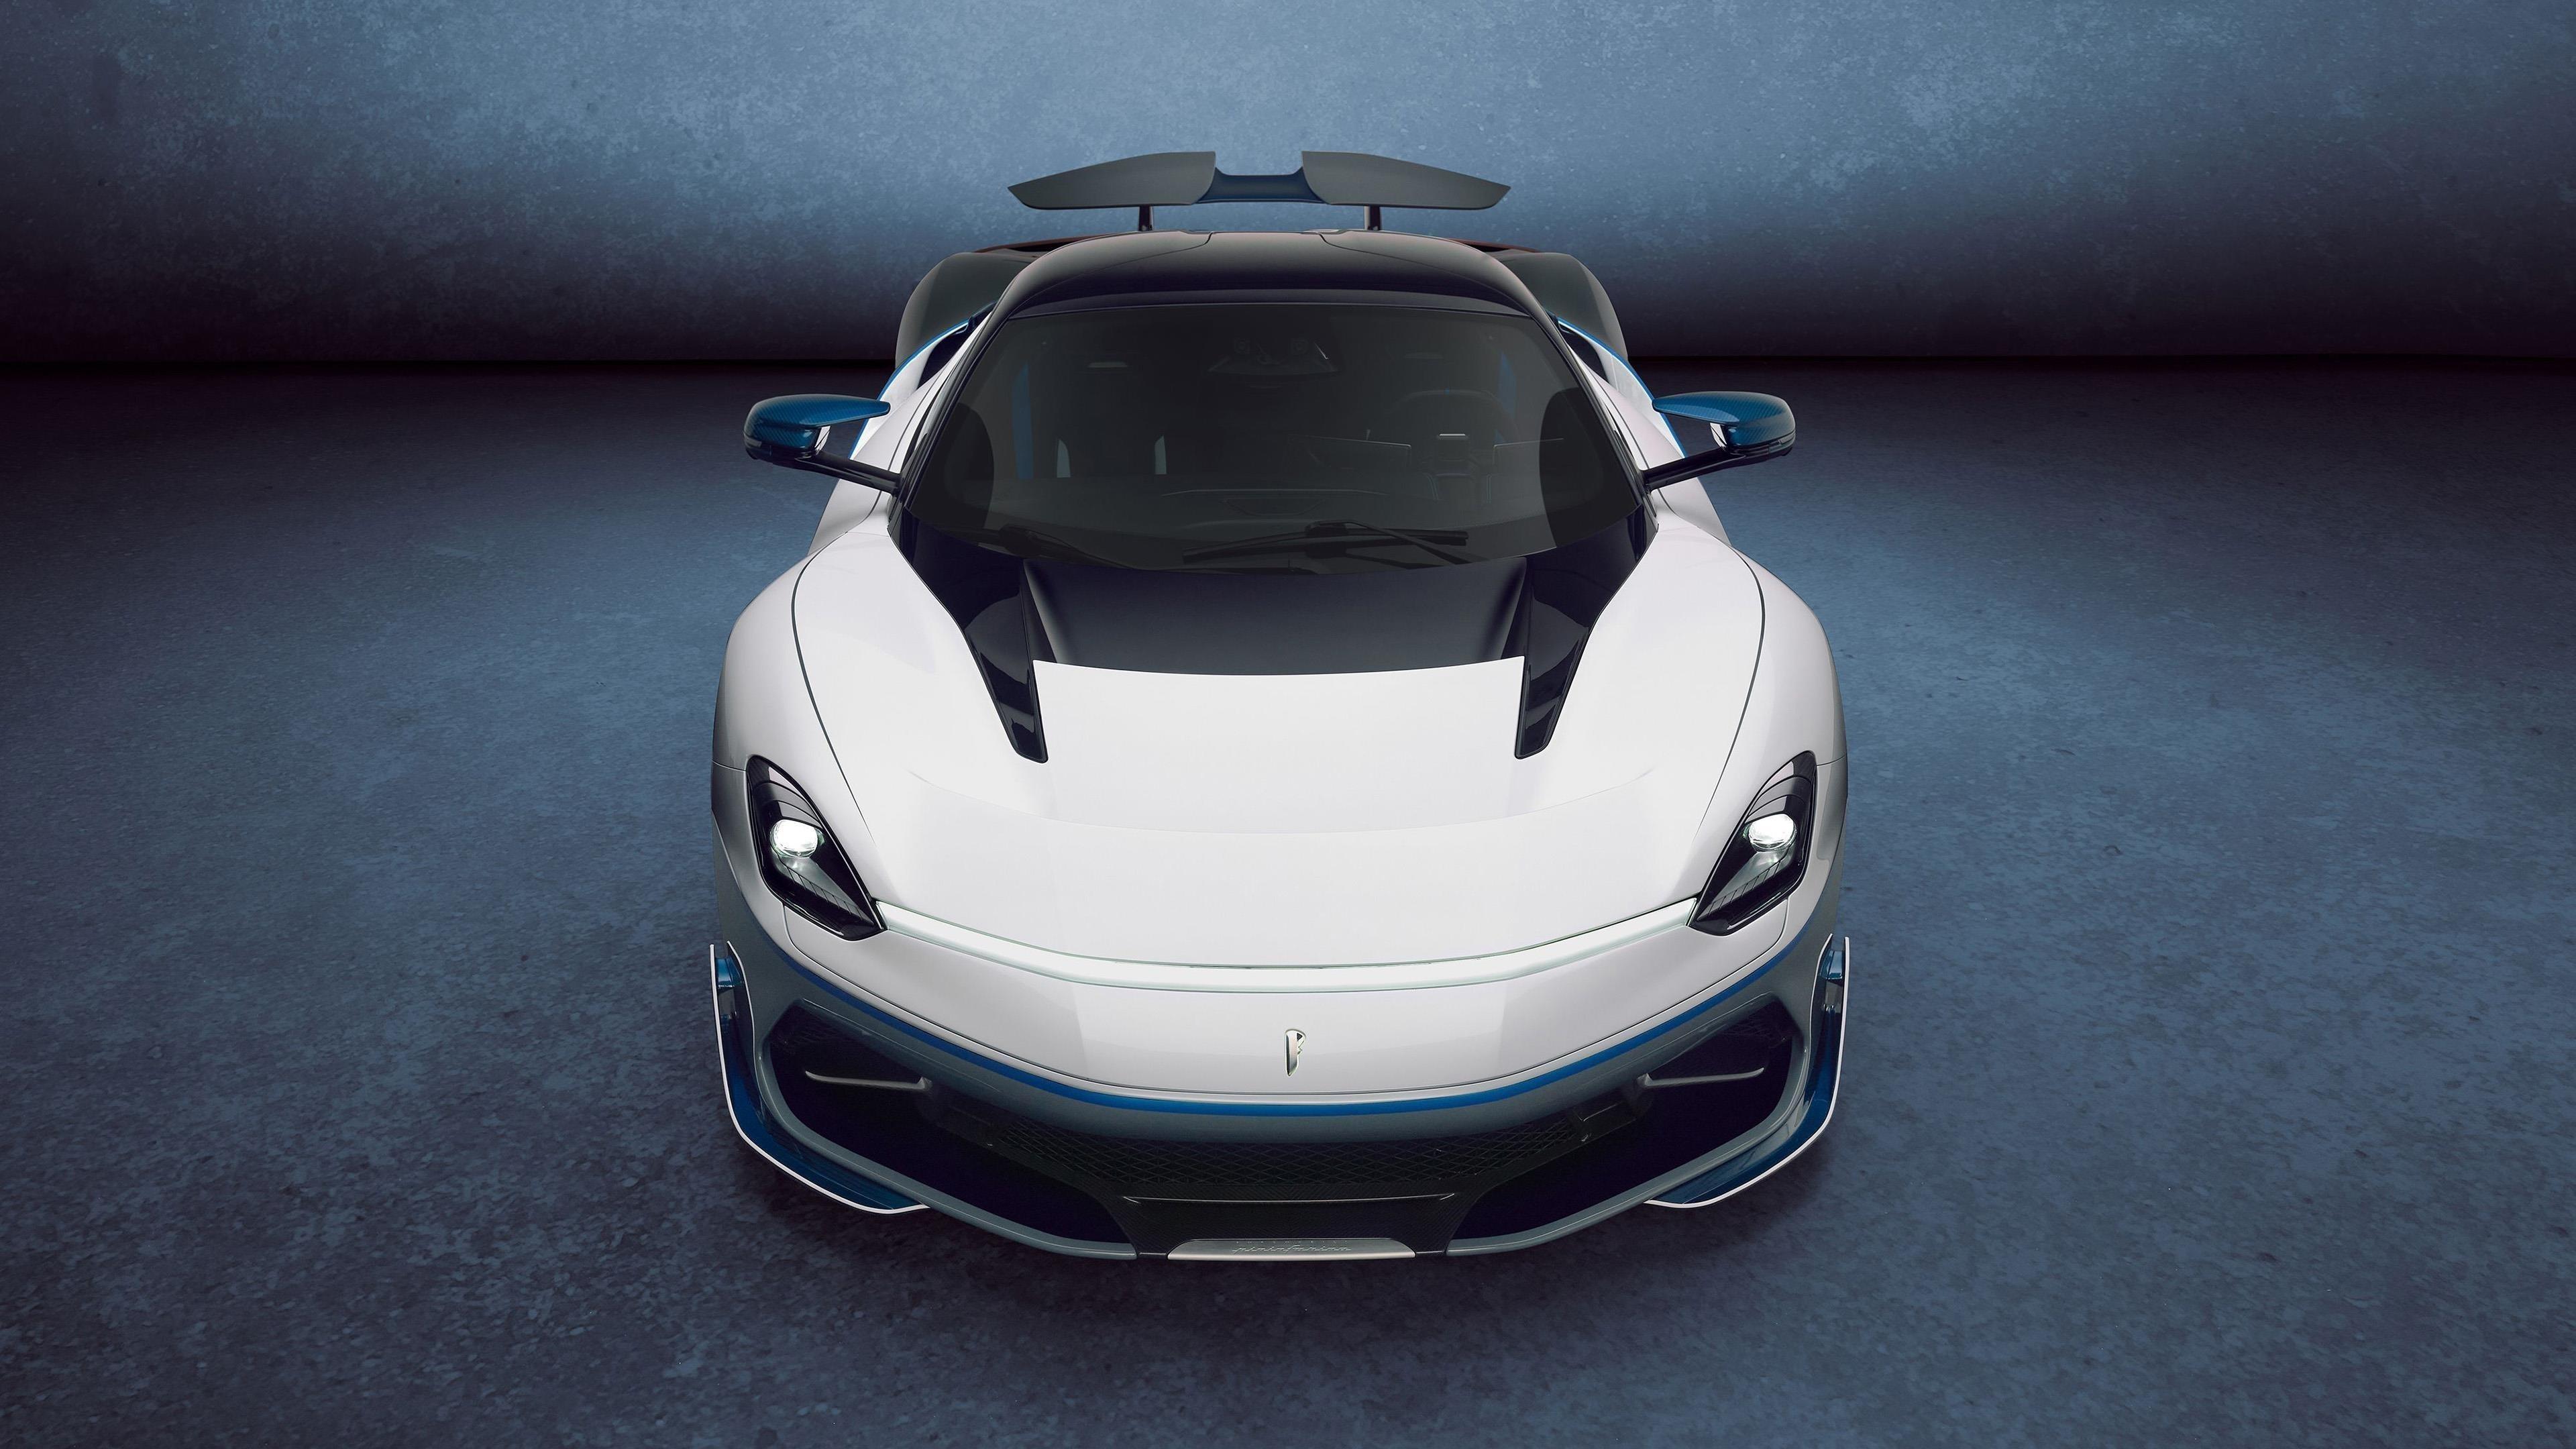 Pininfarina Баттиста юбилей 2020 обои скачать